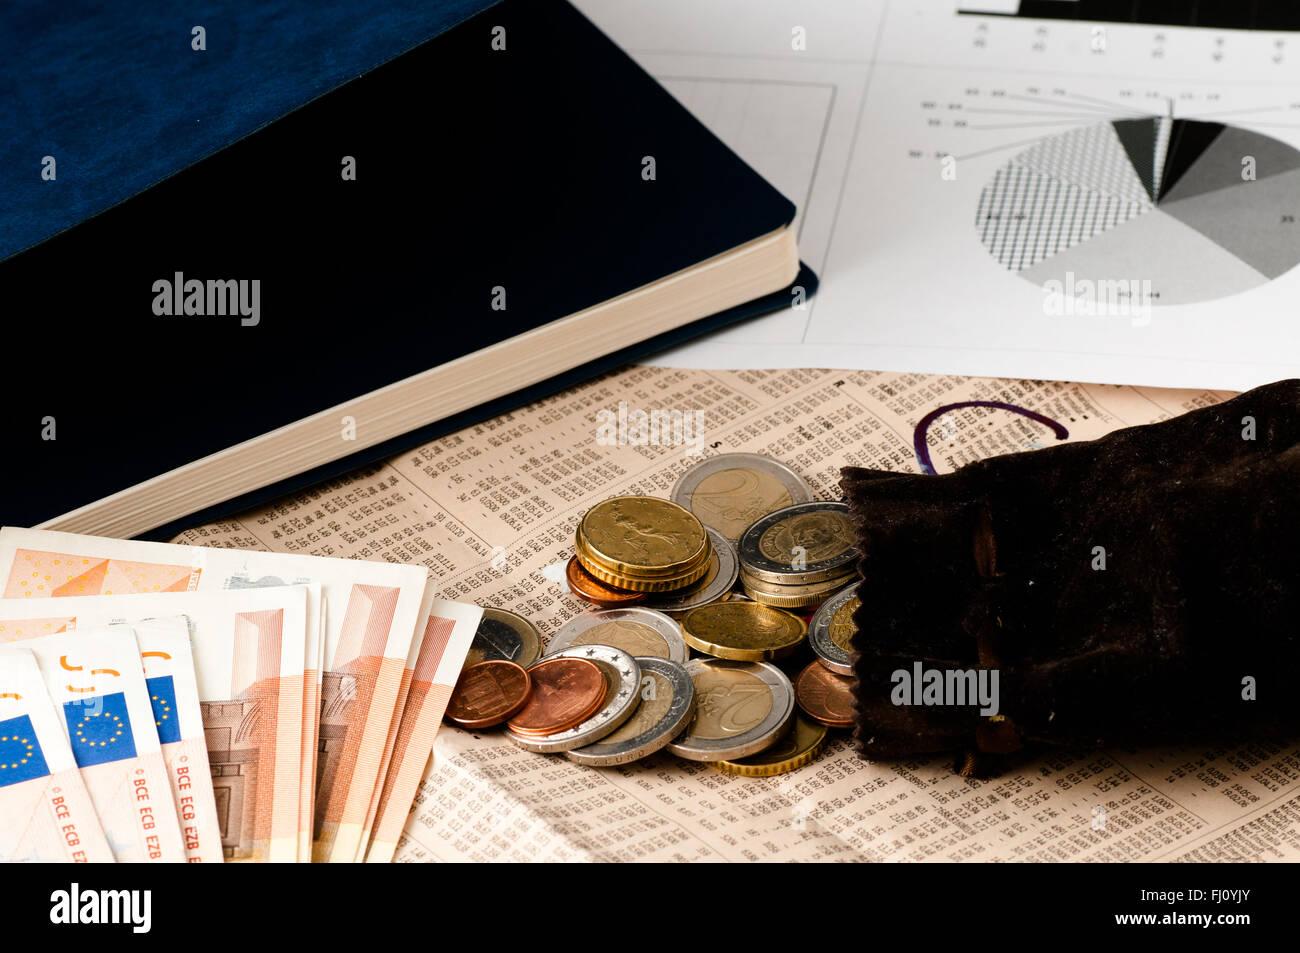 stock market investing their savings - Stock Image